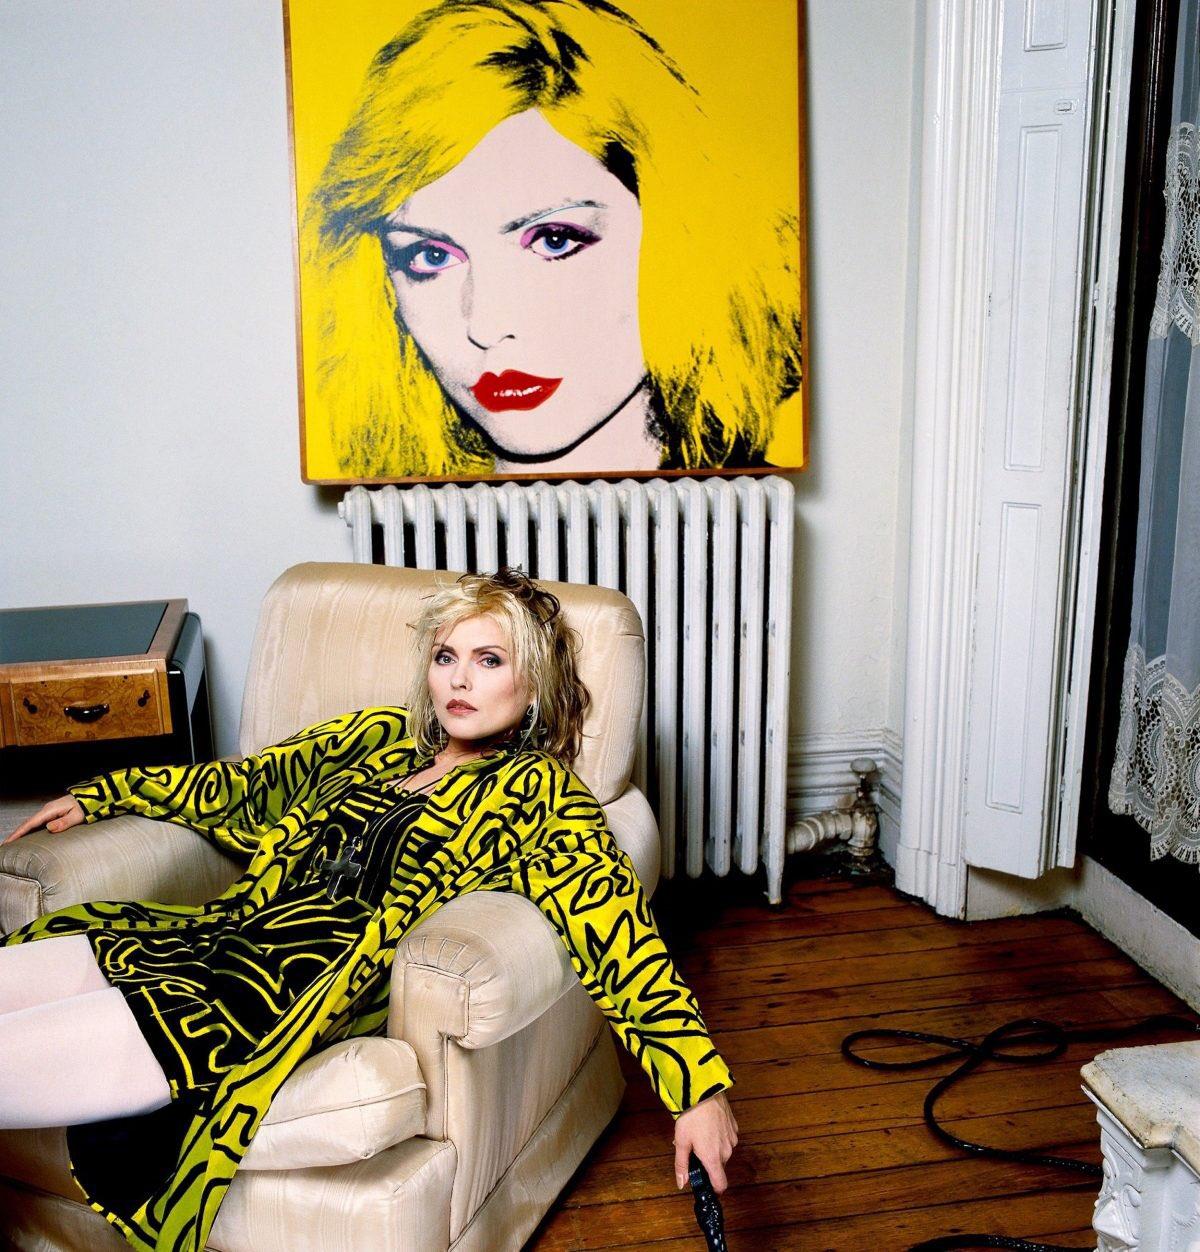 Фотограф Брайан Арис, портреты Дебби Гарри (9).jpg